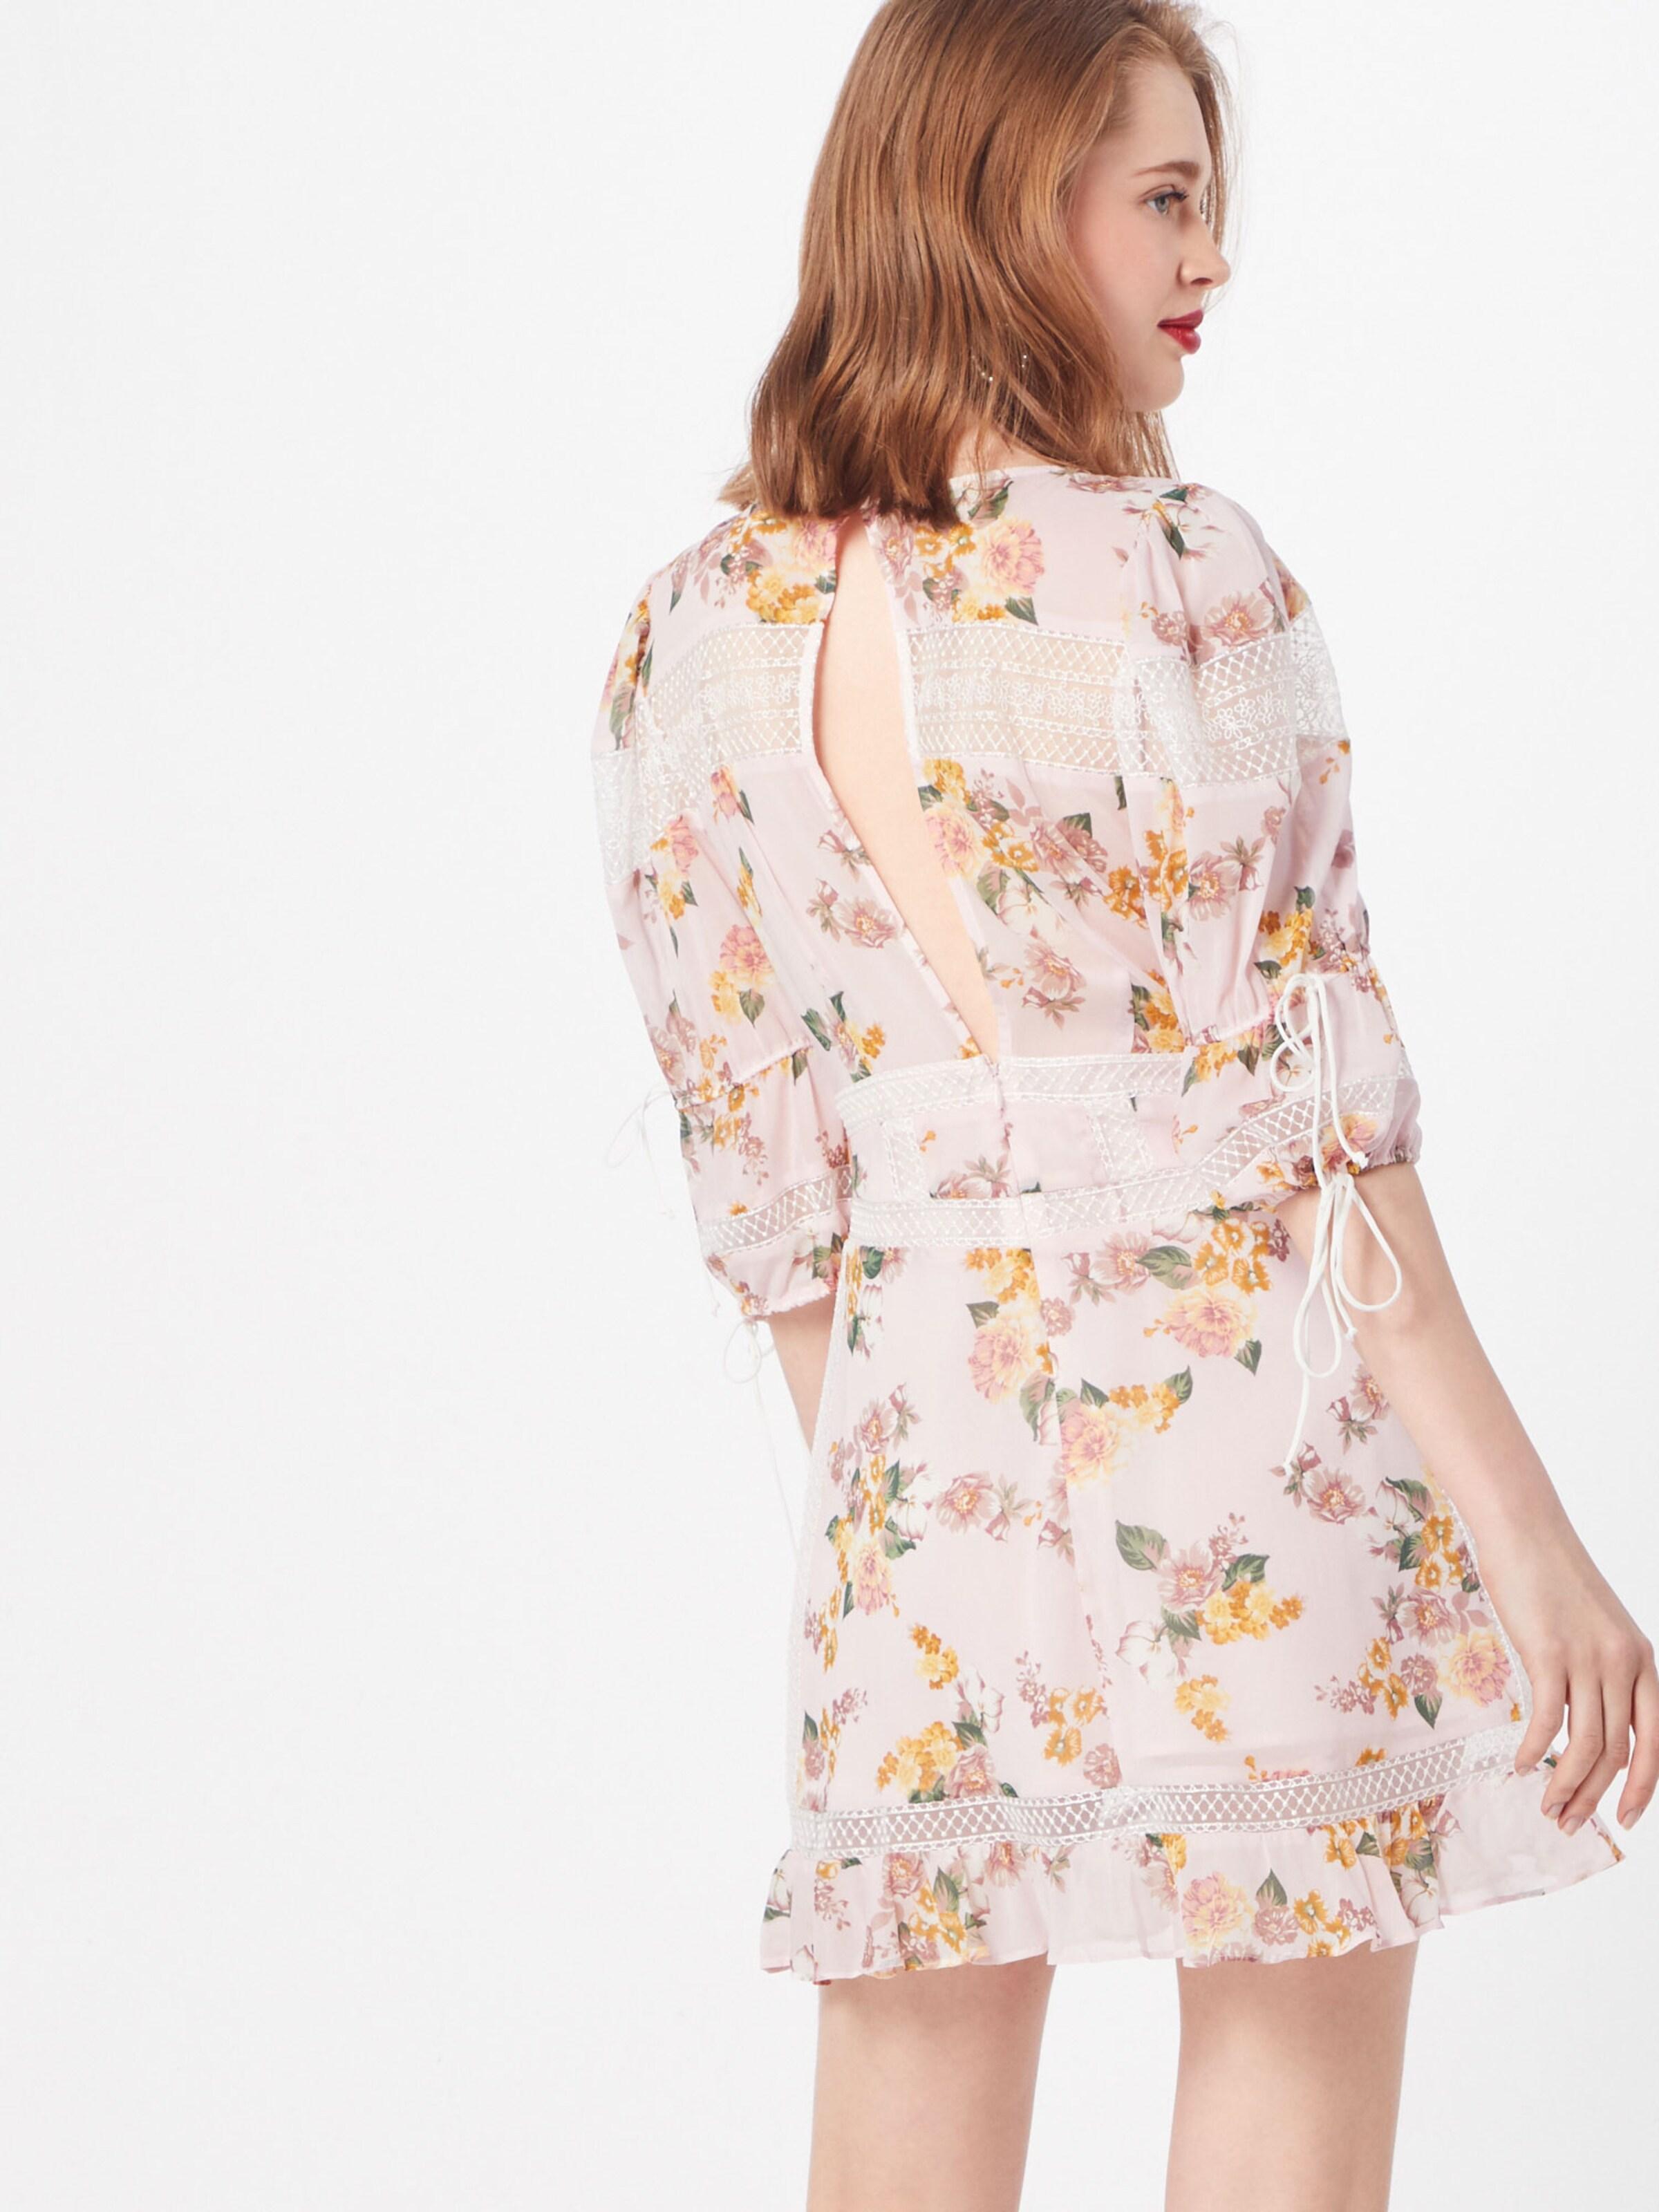 D'été For 'isadora Robe Mini Rose Loveamp; Dress' En Lemons 5AjL4R